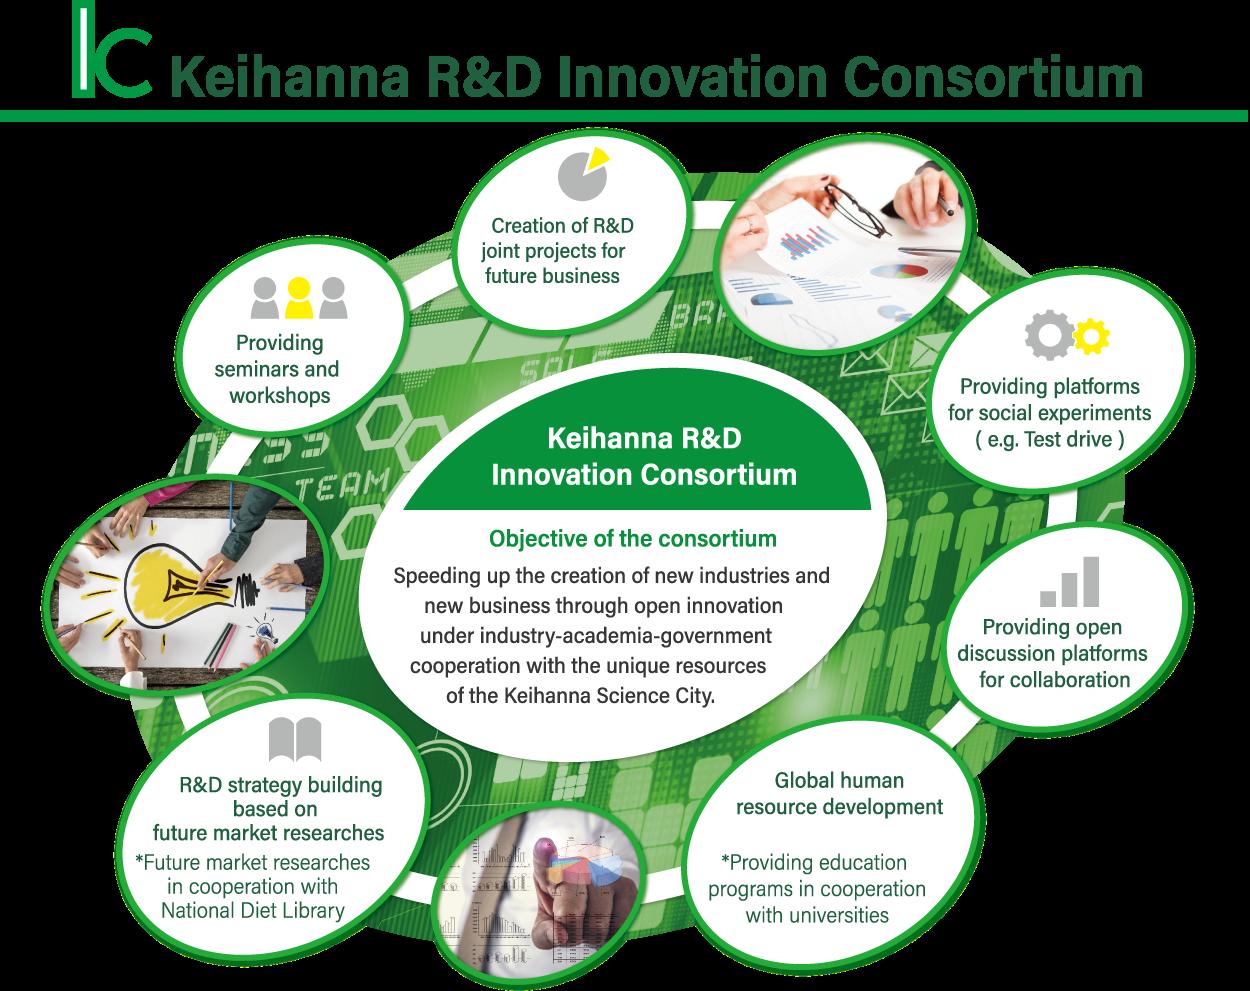 Keihanna Rd Innovation Consortium Keihanna Science City